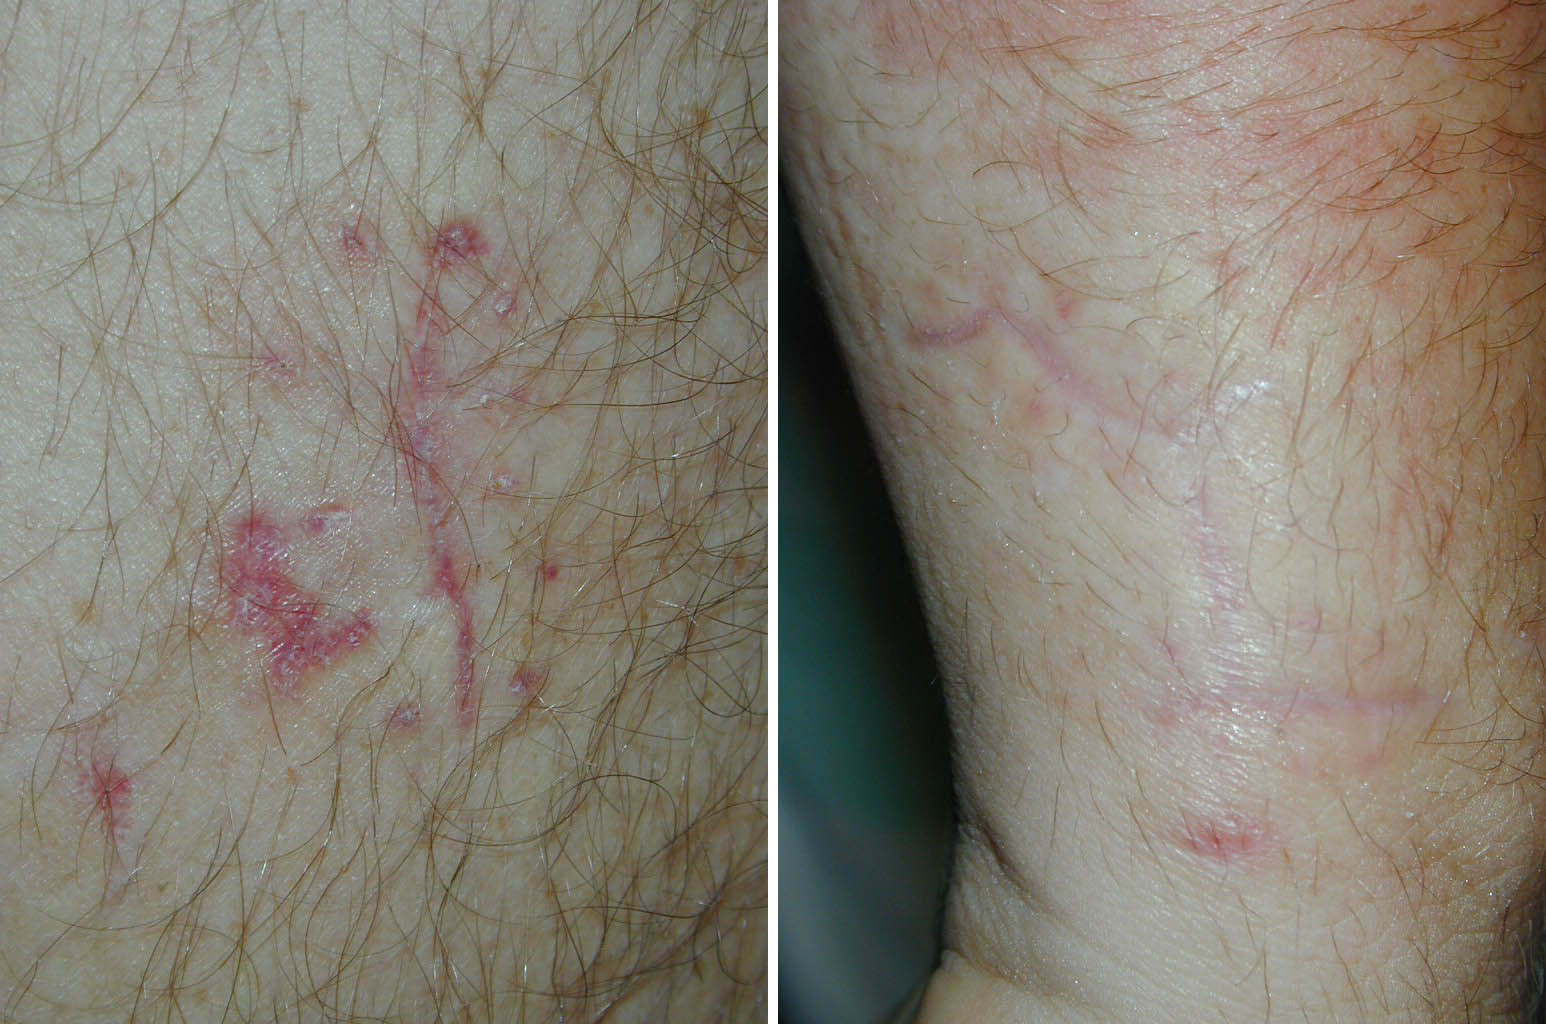 Same patient, same surgeon. No tape was applied on the left. Tape was applied on the right.